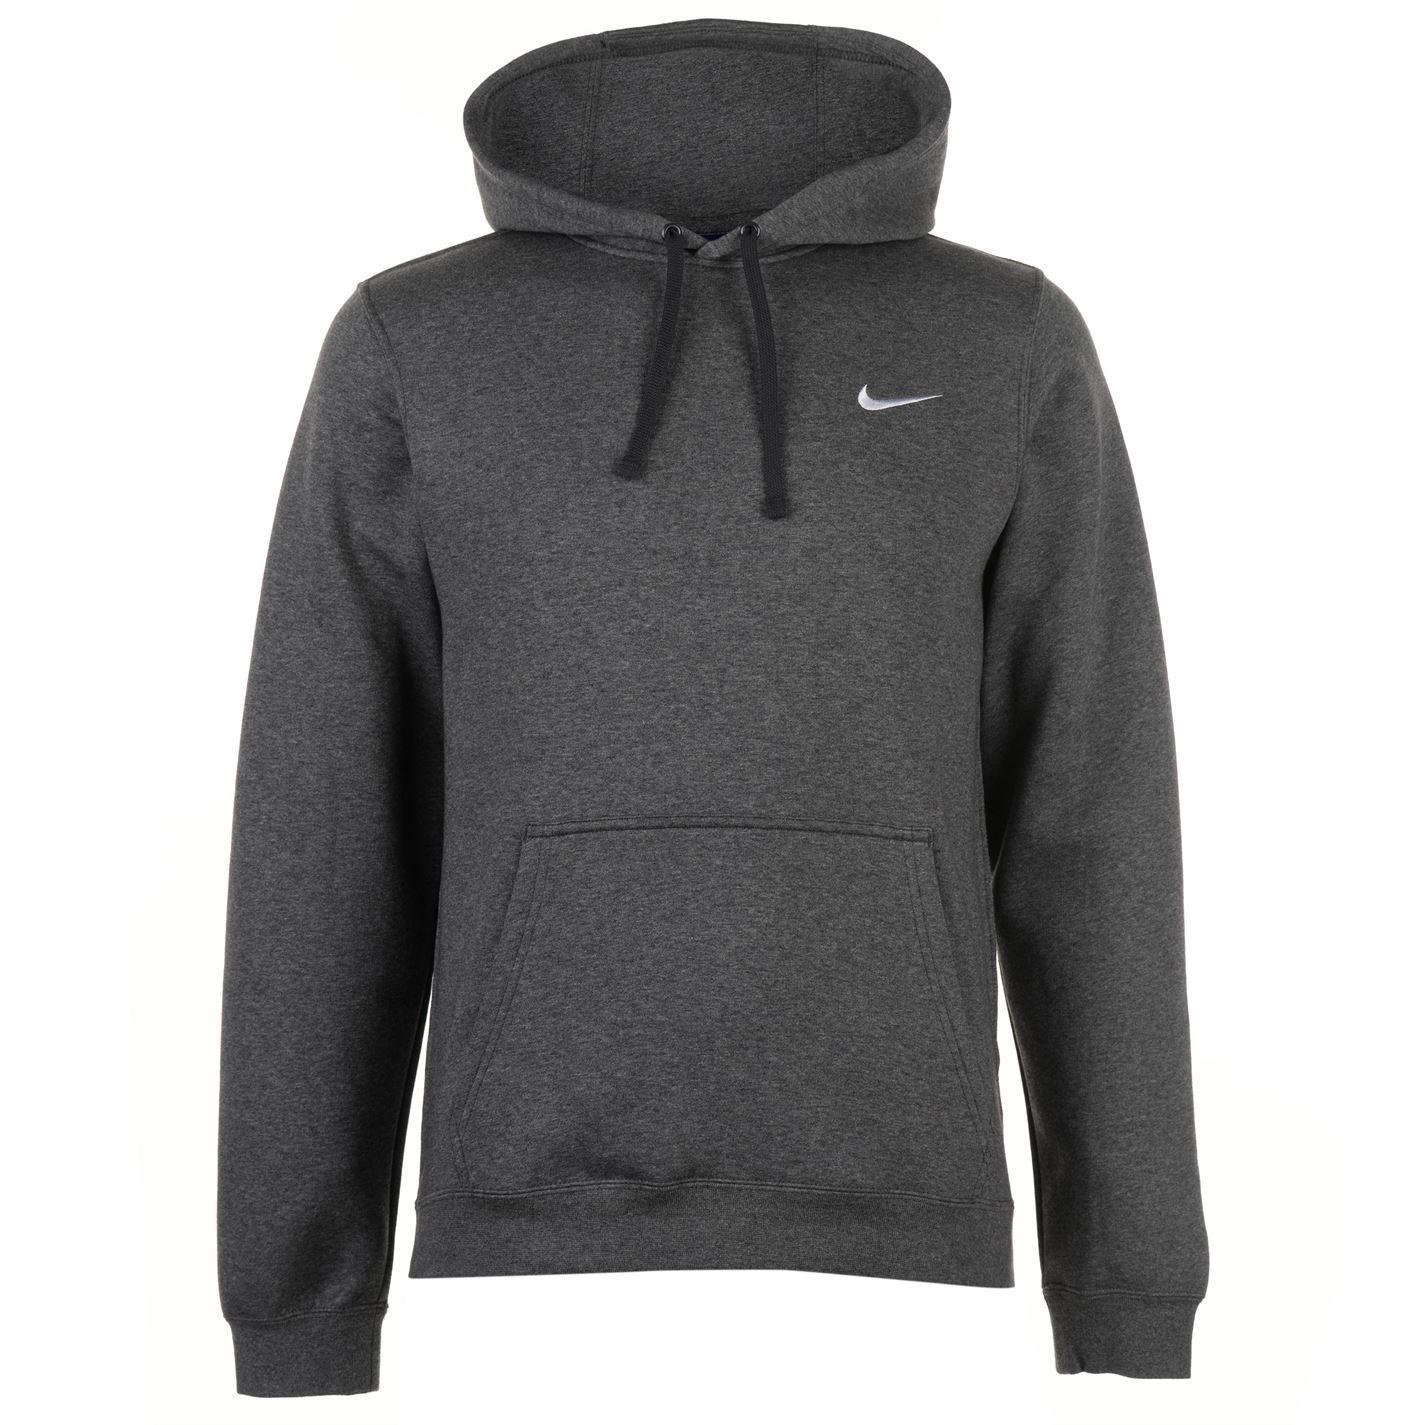 Nike-Fundamentals-Fleece-Lined-Pullover-Hoody-Mens-OTH-Hoodie-Sweatshirt-Sweater thumbnail 13